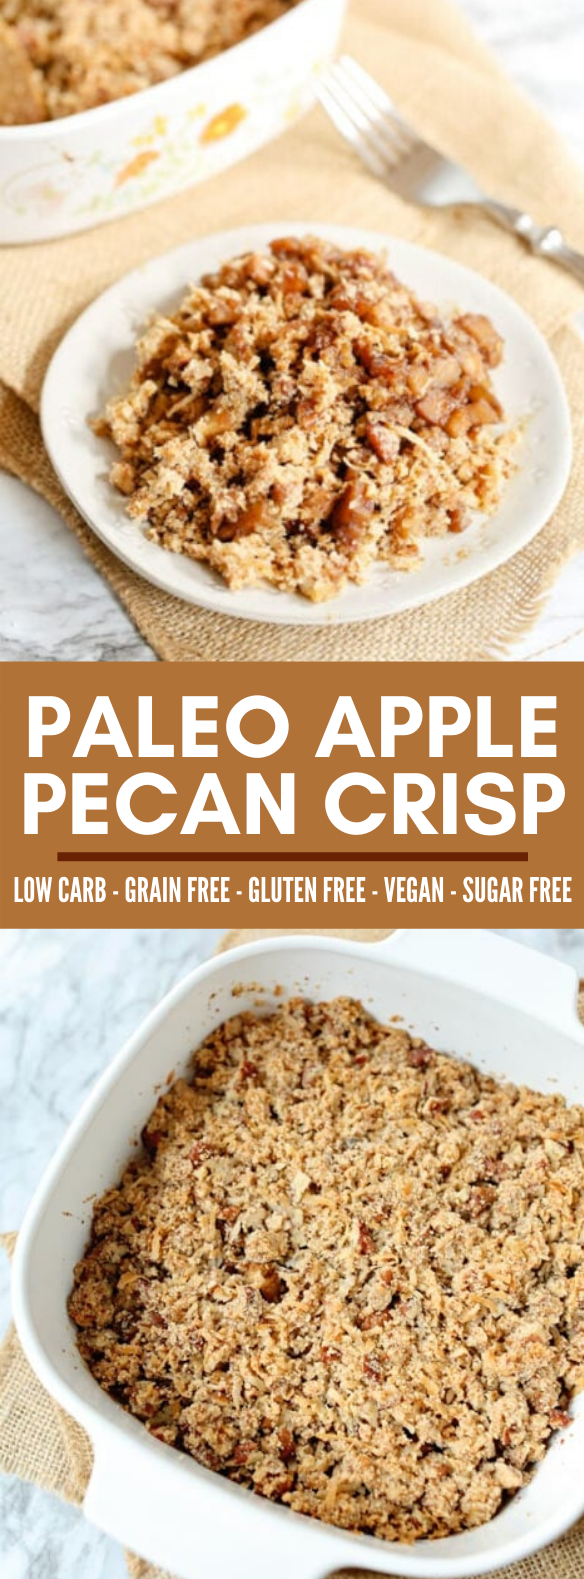 PALEO APPLE PECAN CRISP (VEGAN, GLUTEN-FREE, DAIRY-FREE, GRAIN-FREE) #healthy #diet